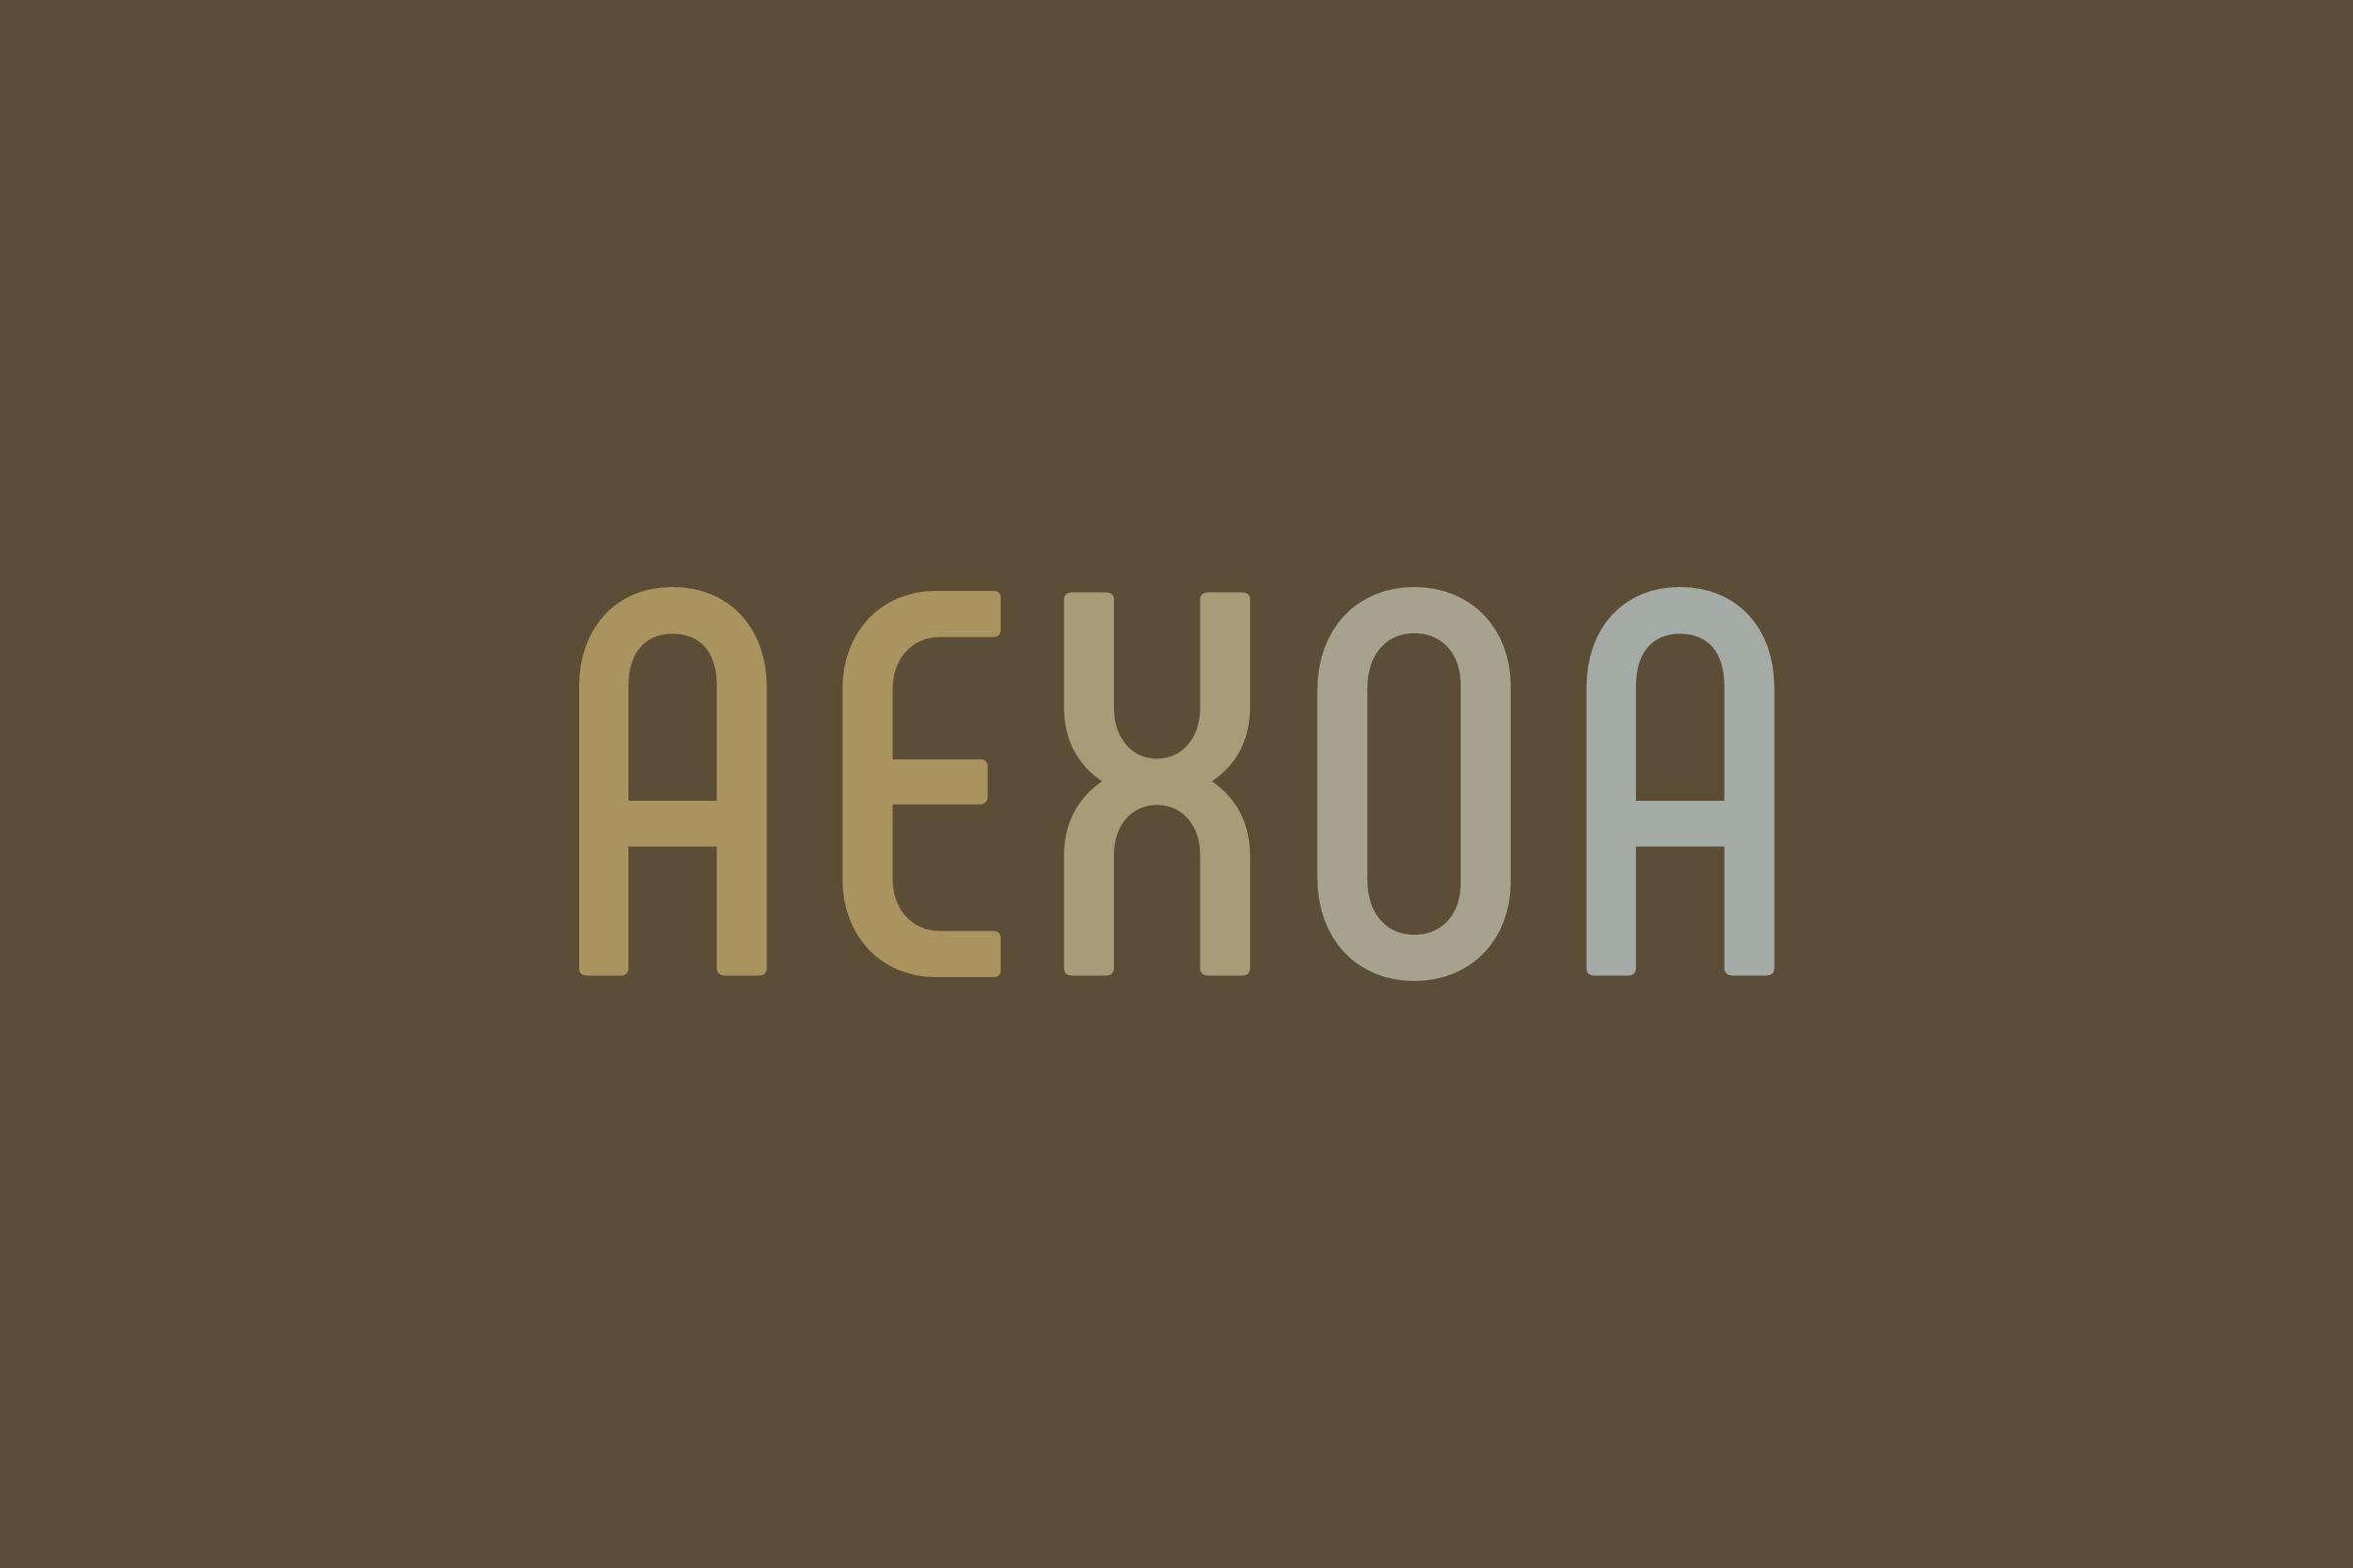 AEXOA